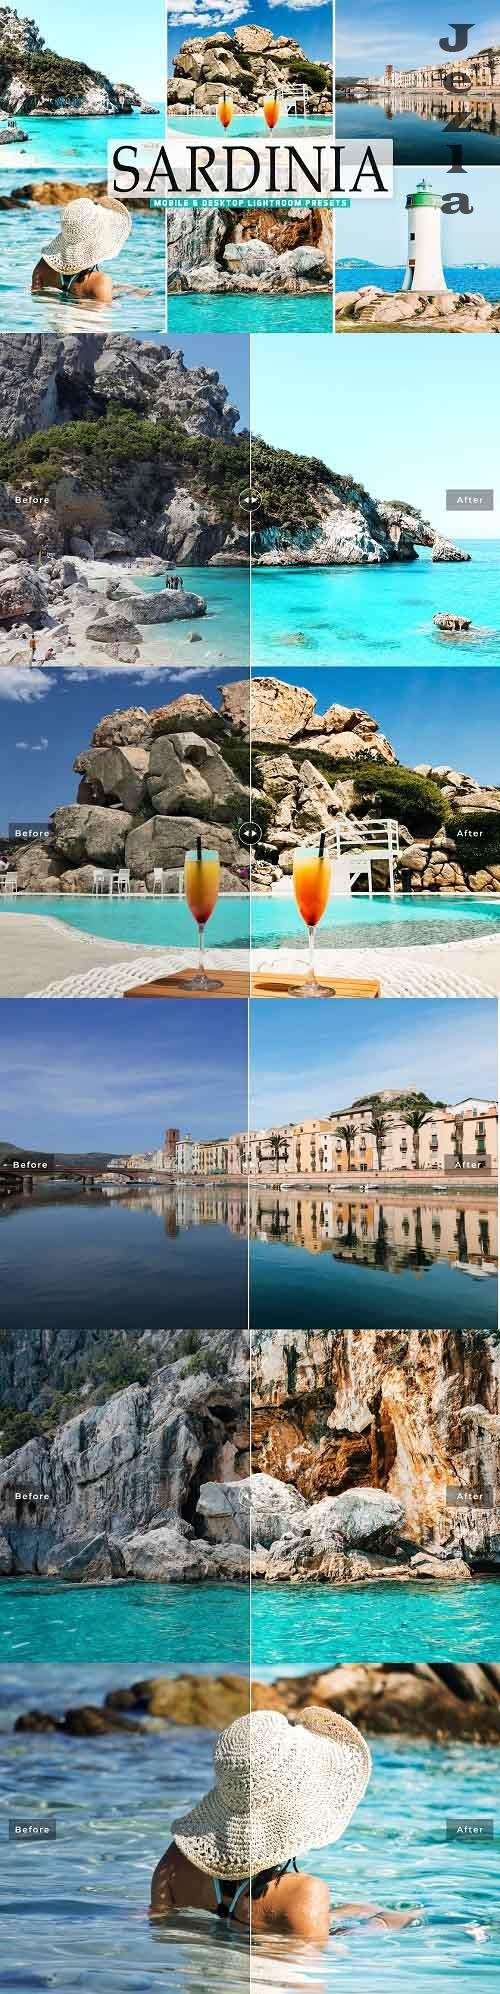 CreativeMarket - Sardinia Pro LRM Presets - 5498511 - Mobile & Desktop